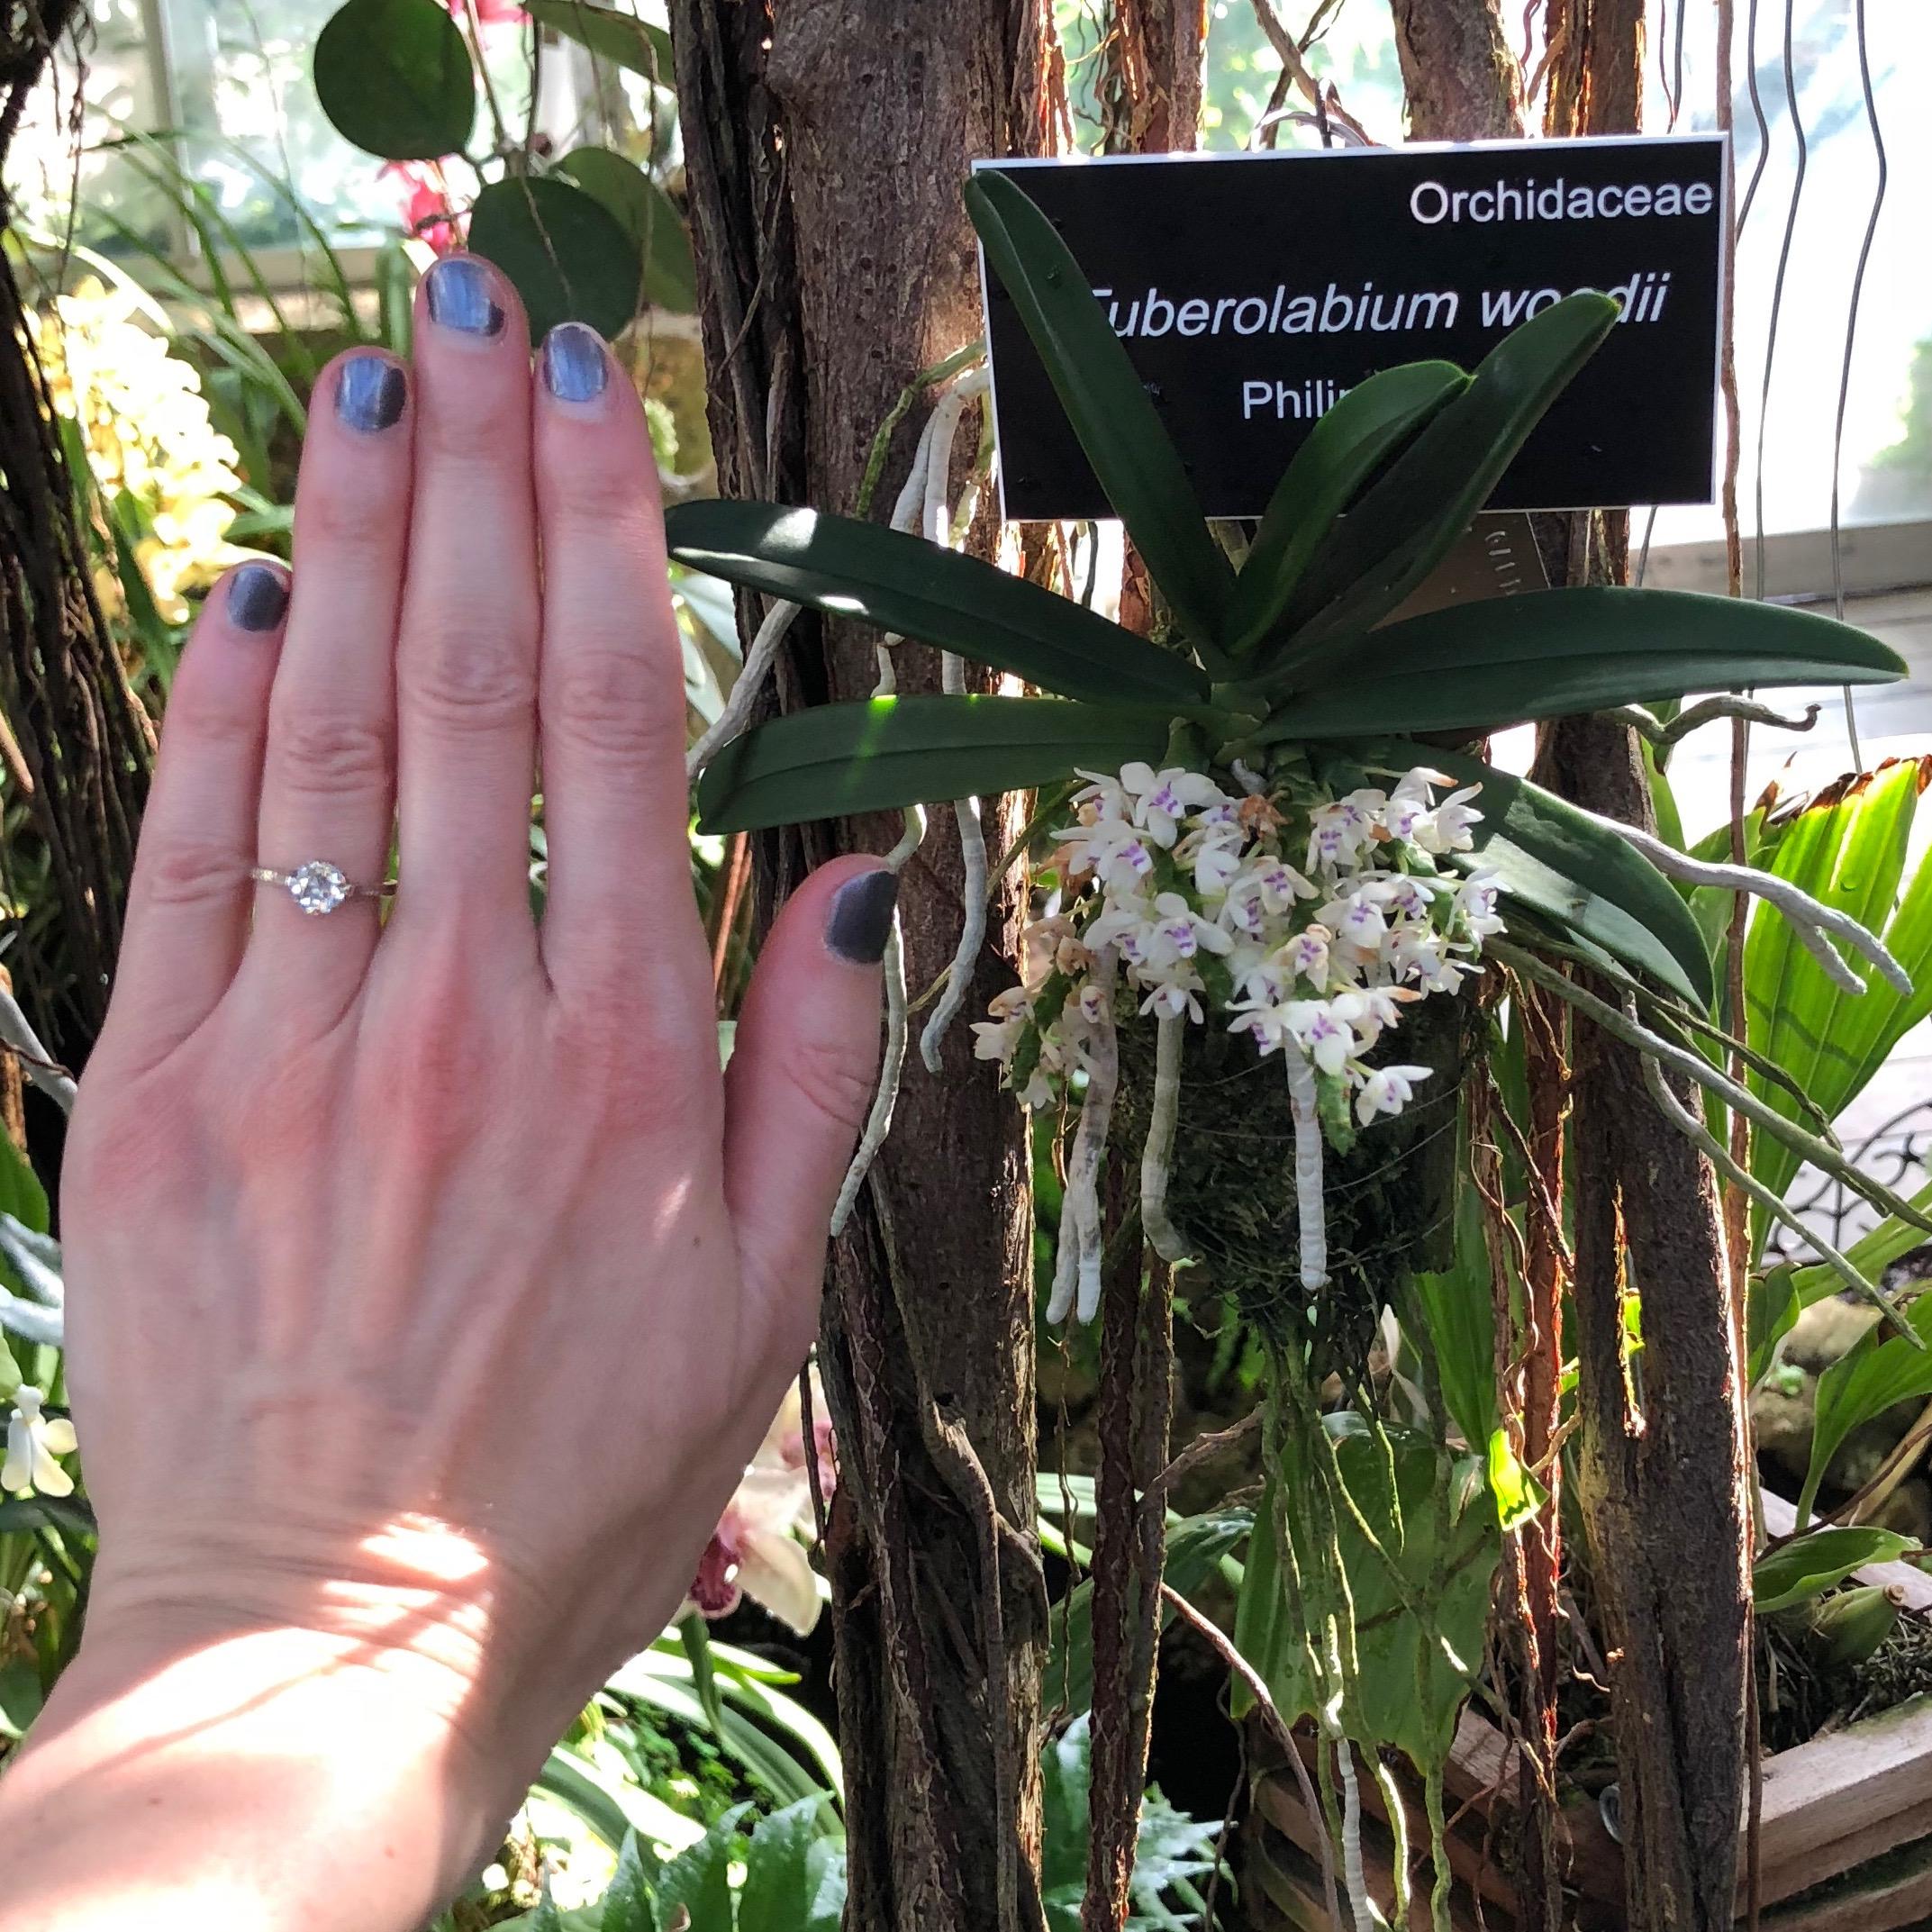 Tuberolabium woodii